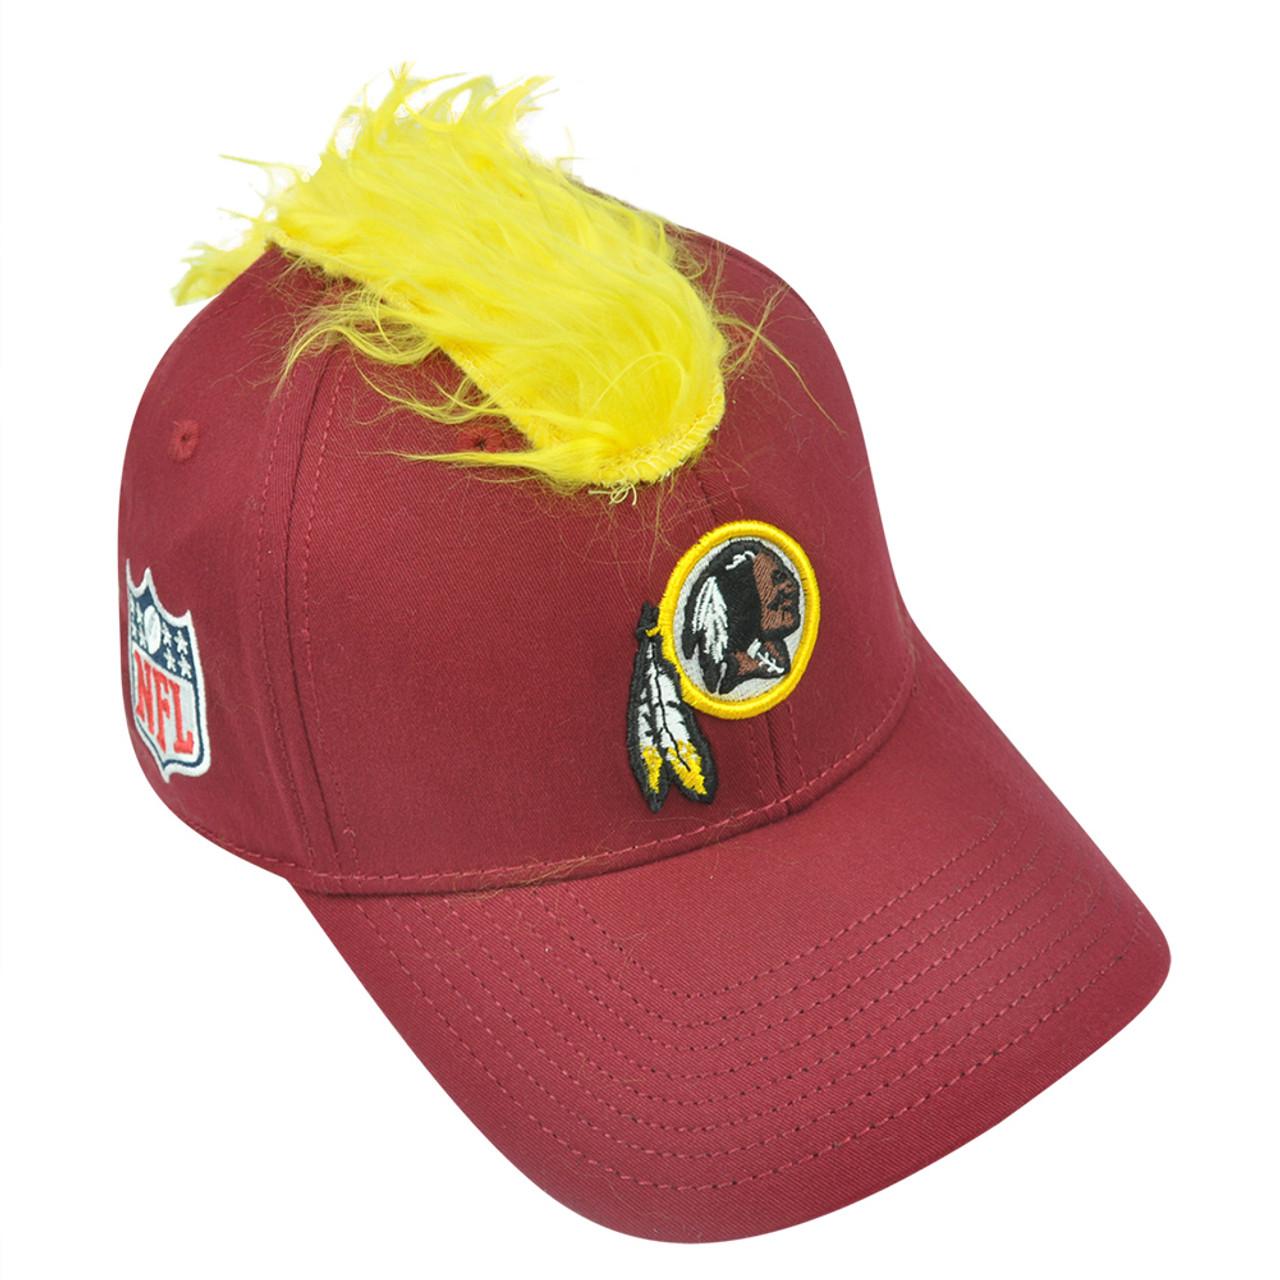 wholesale dealer b02a2 ee2f3 NFL Washington Redskins Spike Flex Fit Small Medium Mohawk Reebok Hat Cap  Stretc - Cap Store Online.com